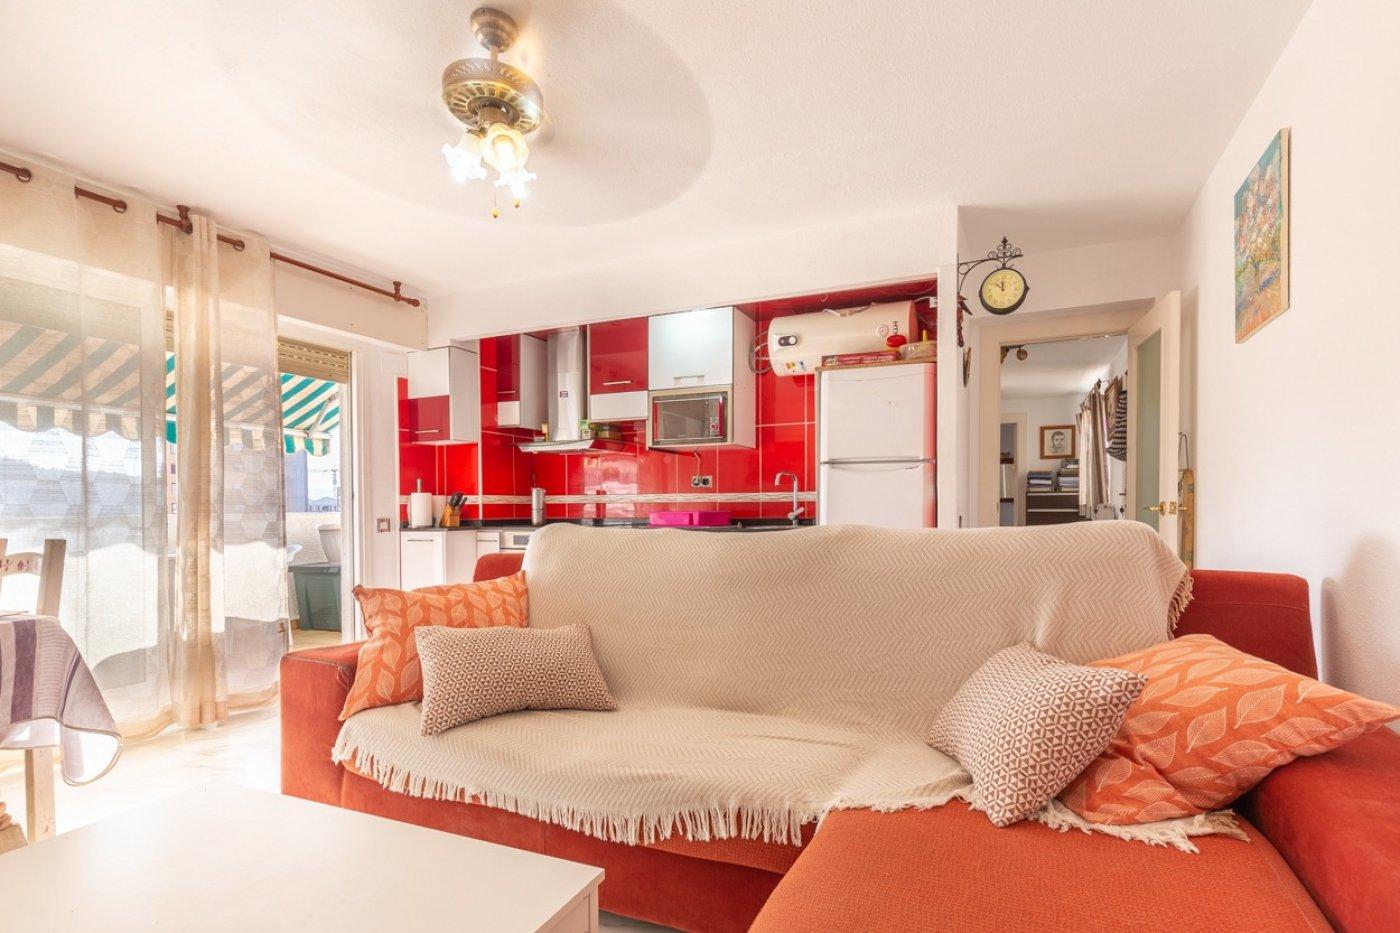 Piso en Benidorm zona Cala de Benidorm de 85 m²